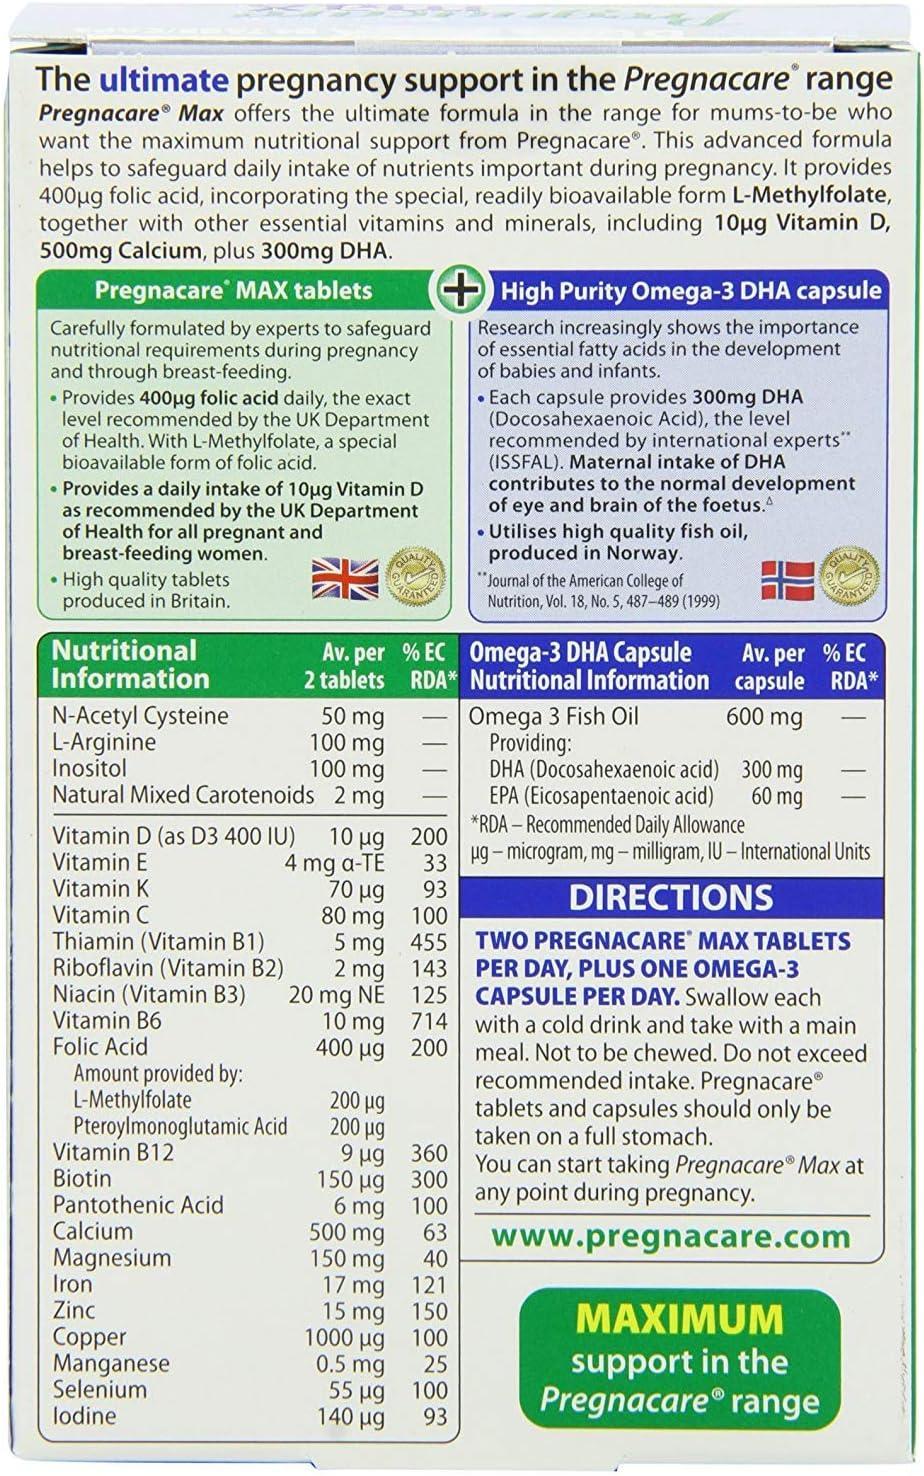 (3 PACK) - Vitabiotics Pregnacare Max - Capsules & Tablets | 28 56s s | 3 PACK - SUPER SAVER - SAVE MONEY